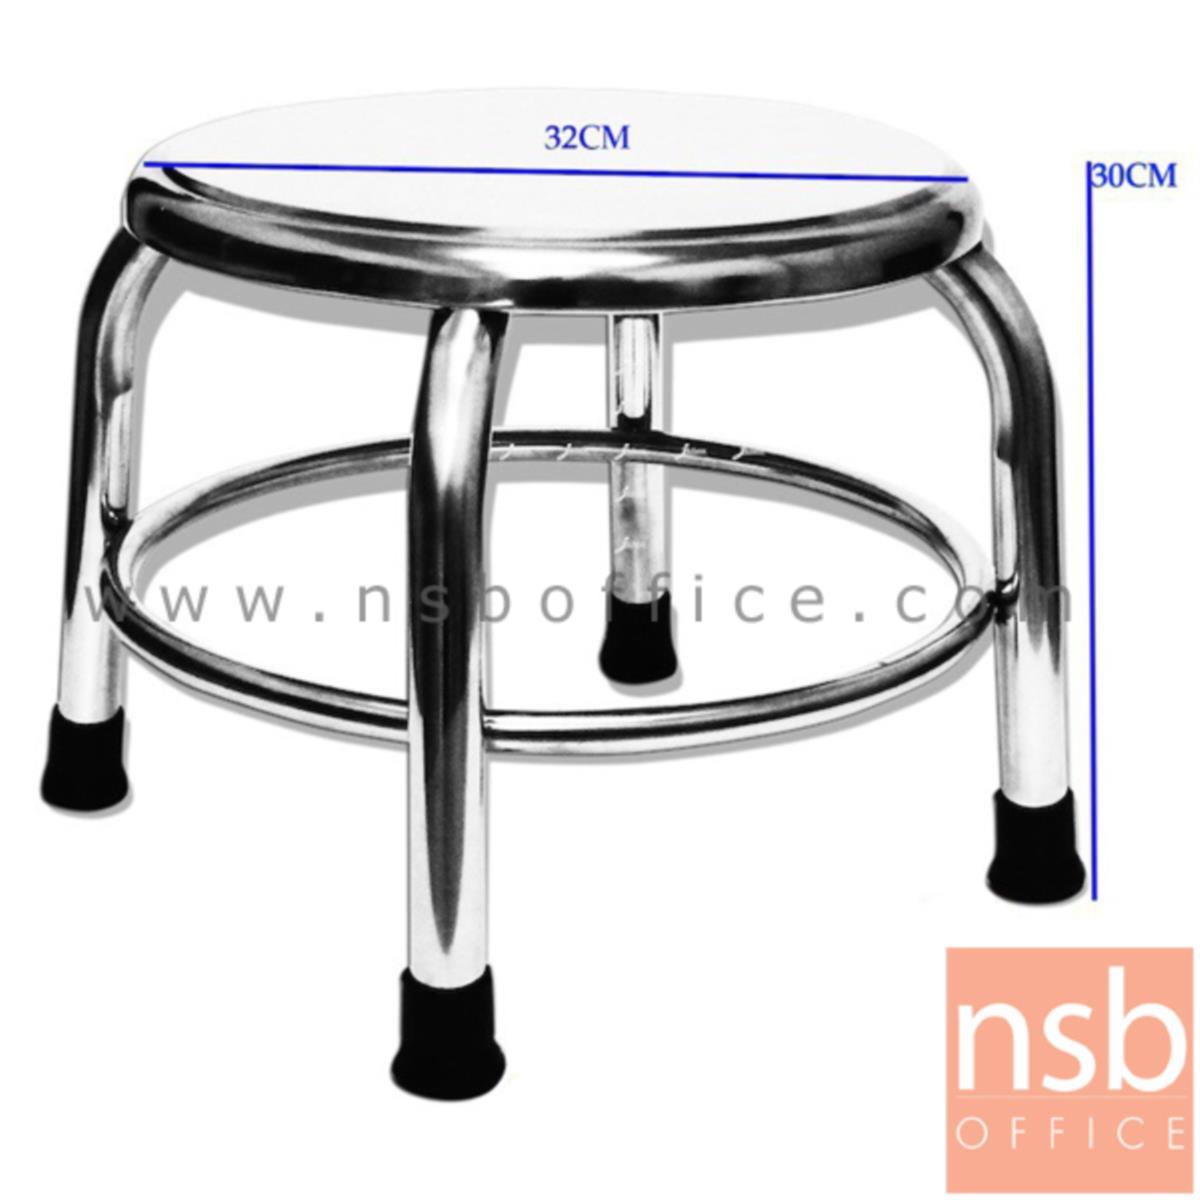 G12A205:เก้าอี้สเตนเลสกลม ขนาด 30Di*30H cm.